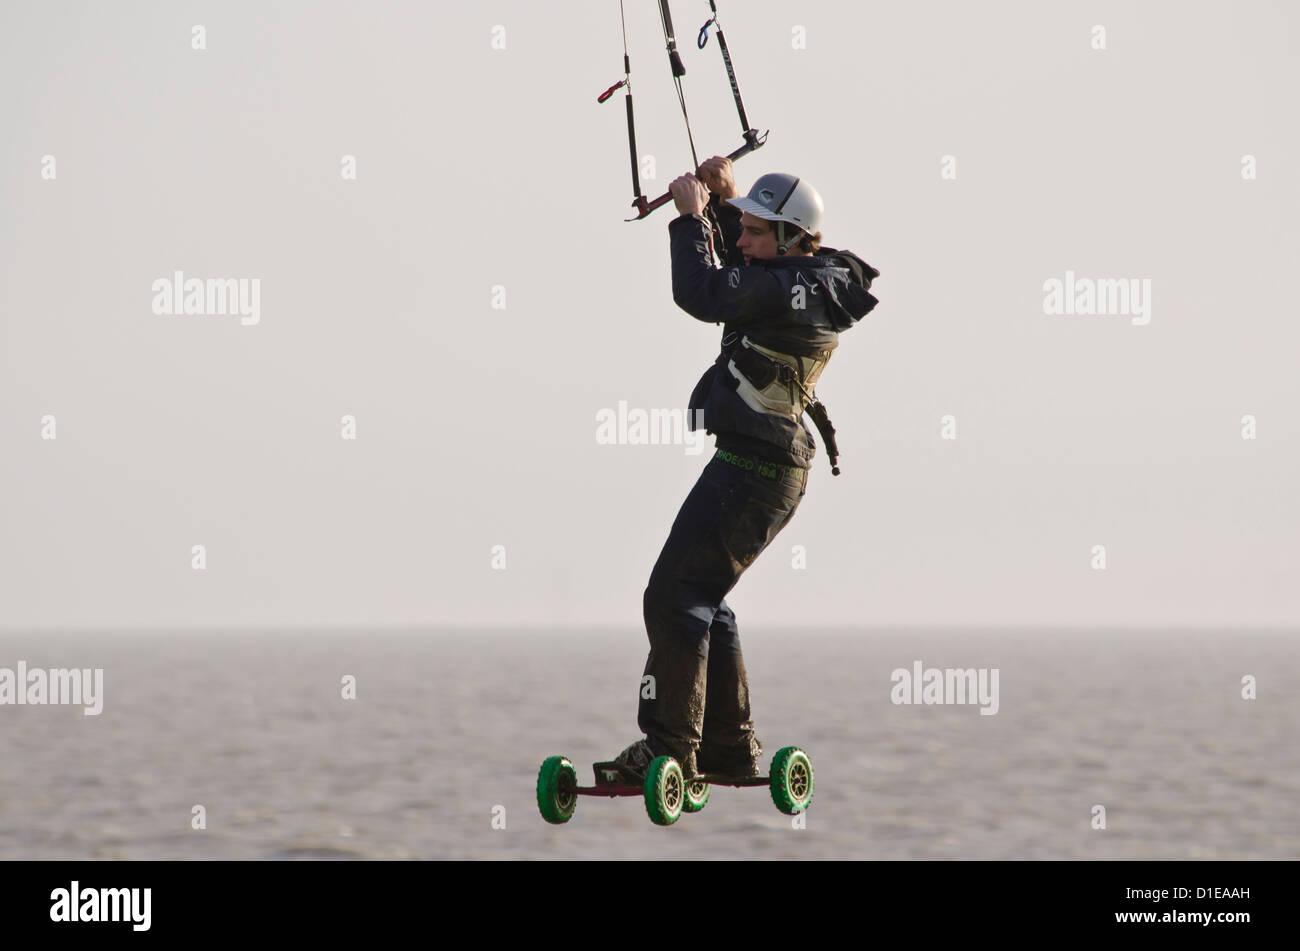 Extreme sport 'land boarding' - Stock Image